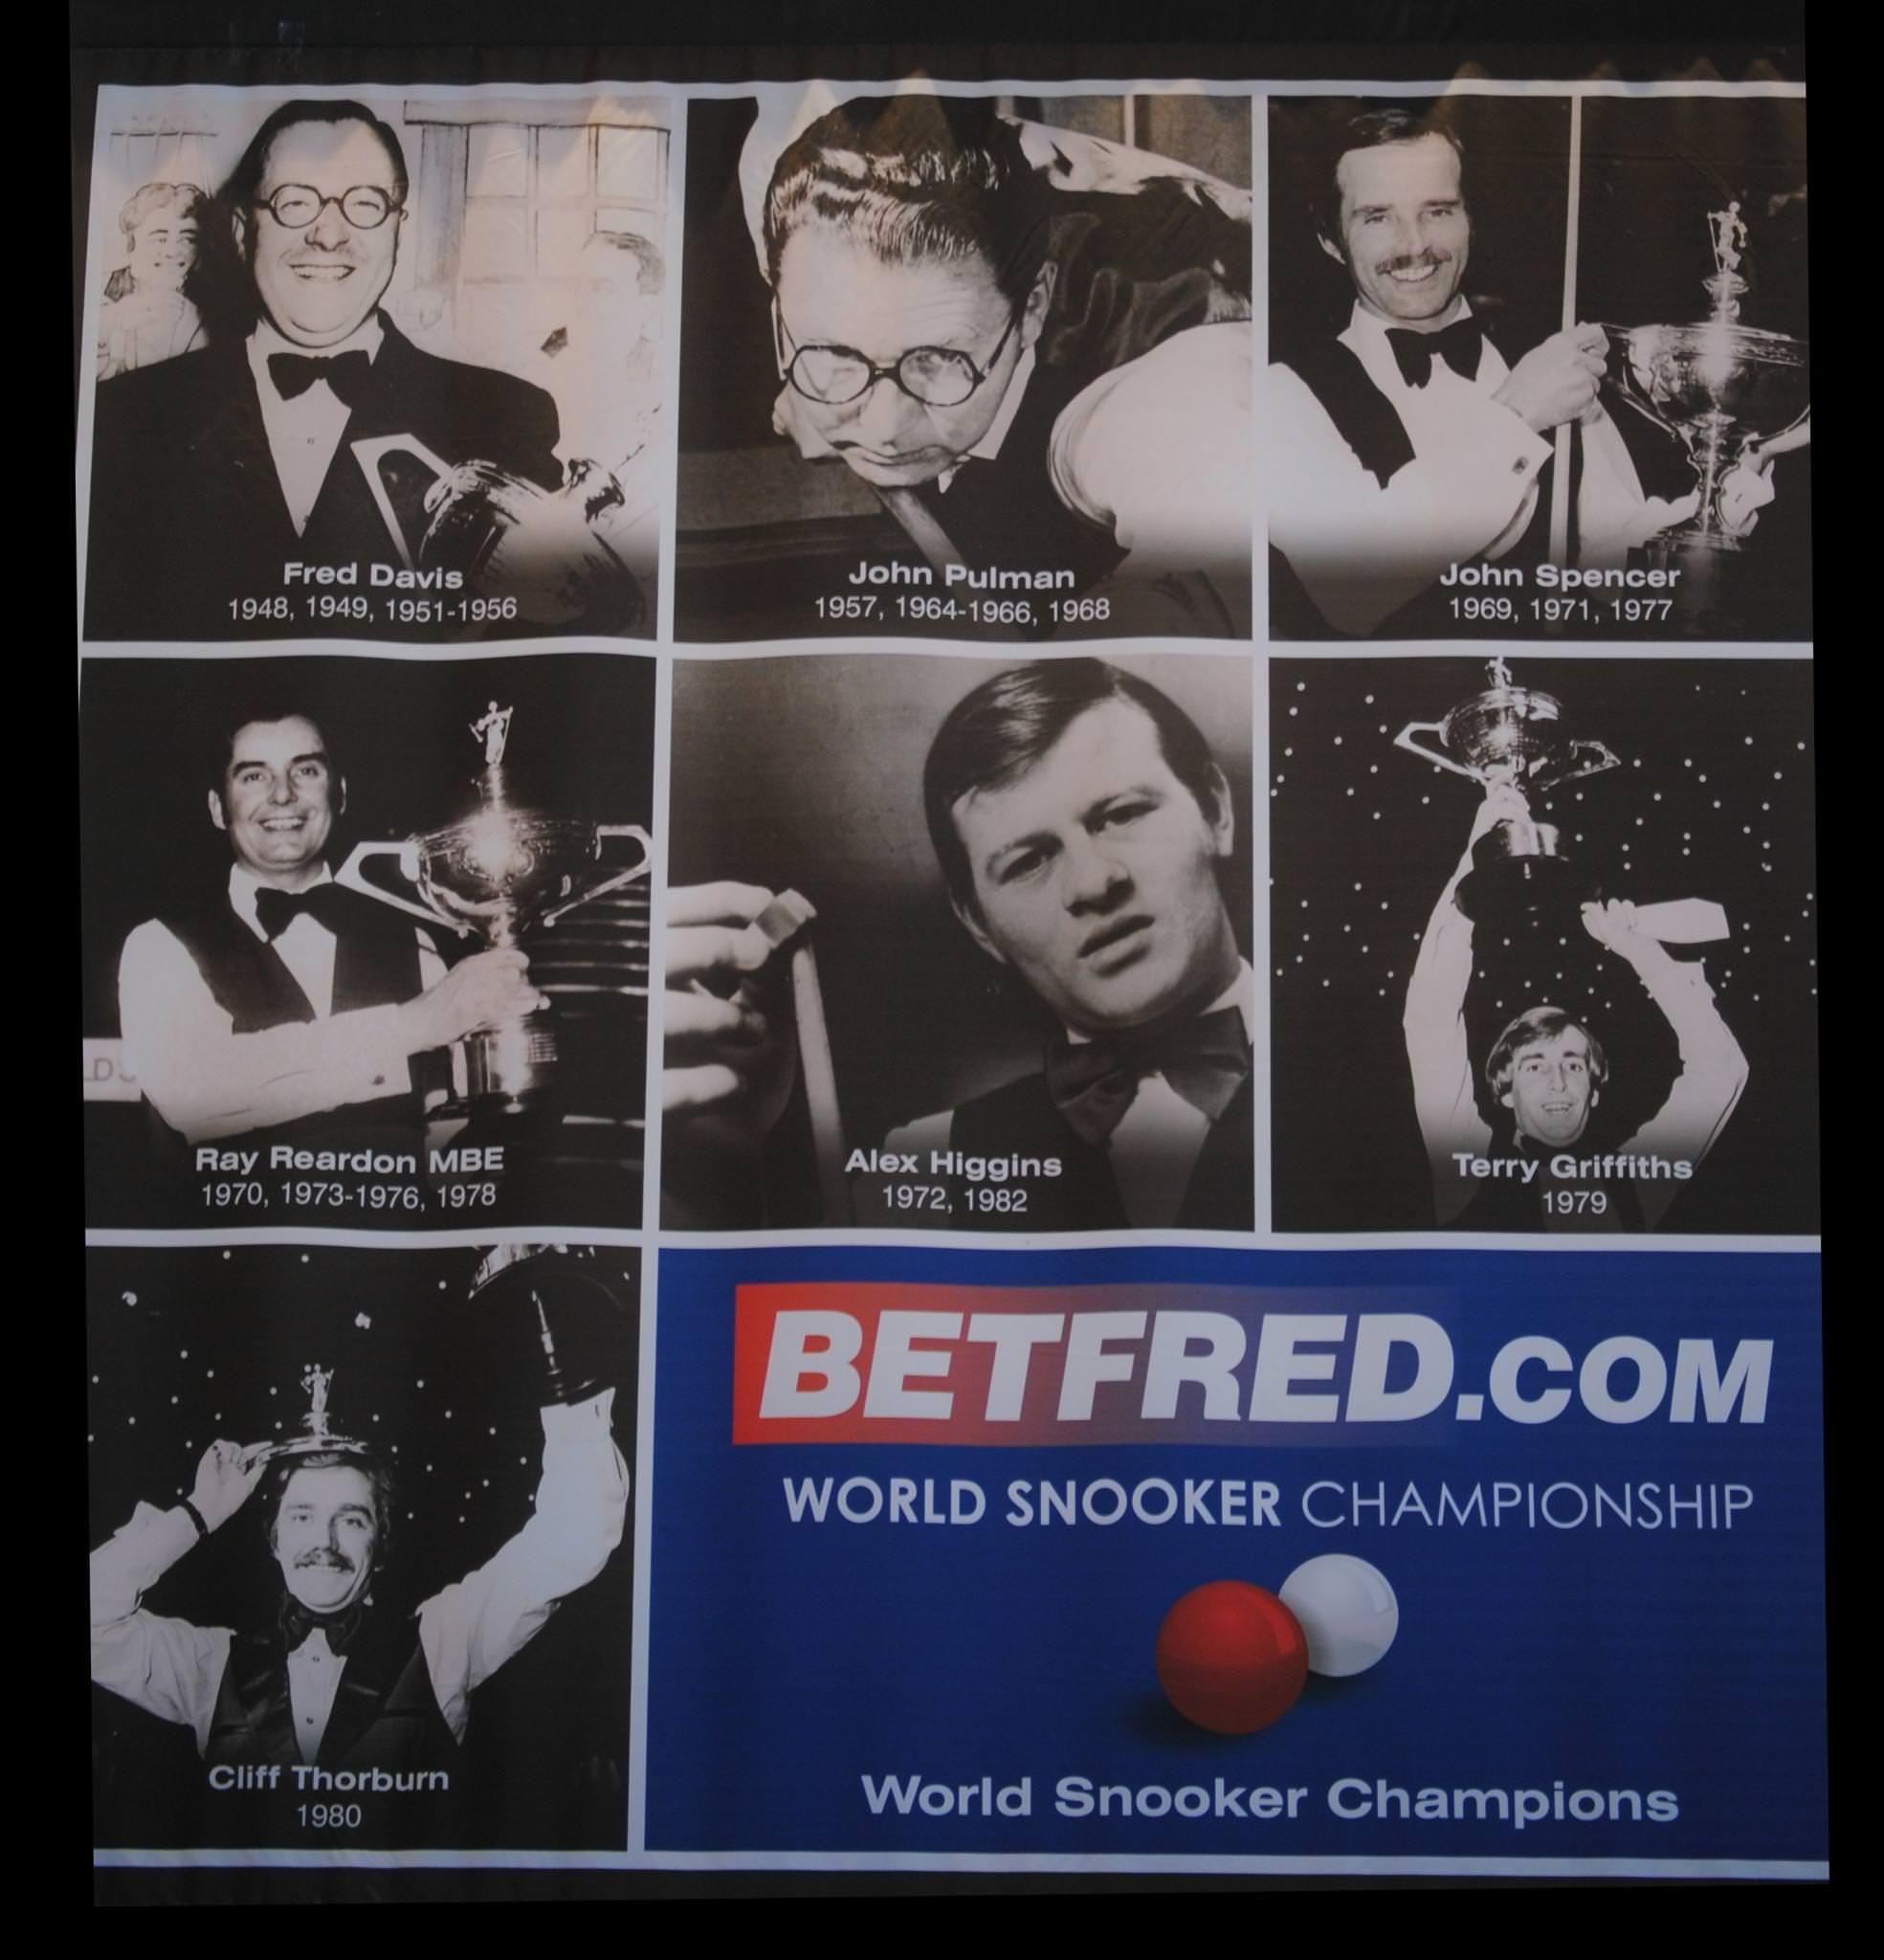 1948 World Snooker Championship